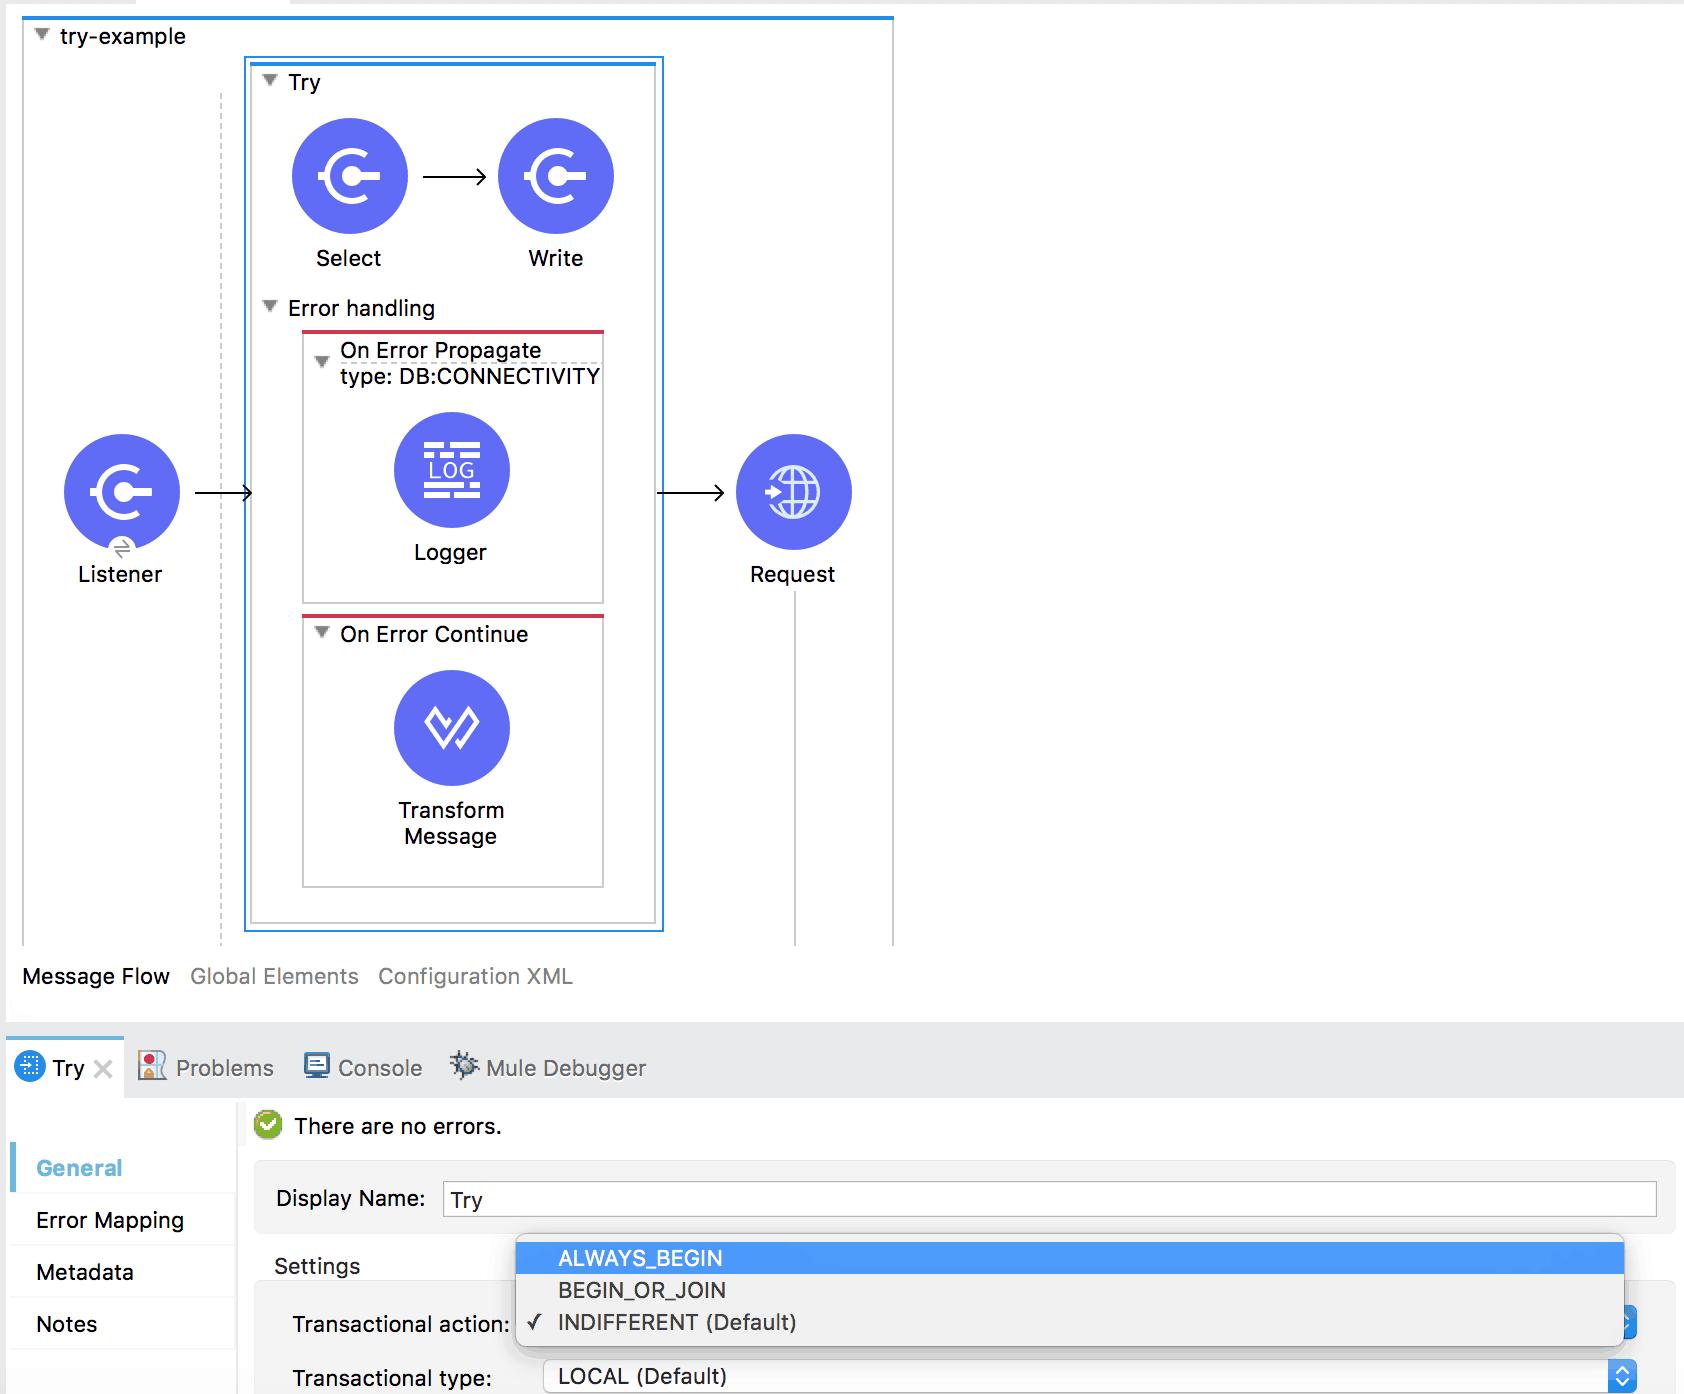 A Look Into Error Handling In Mule 4 Beta